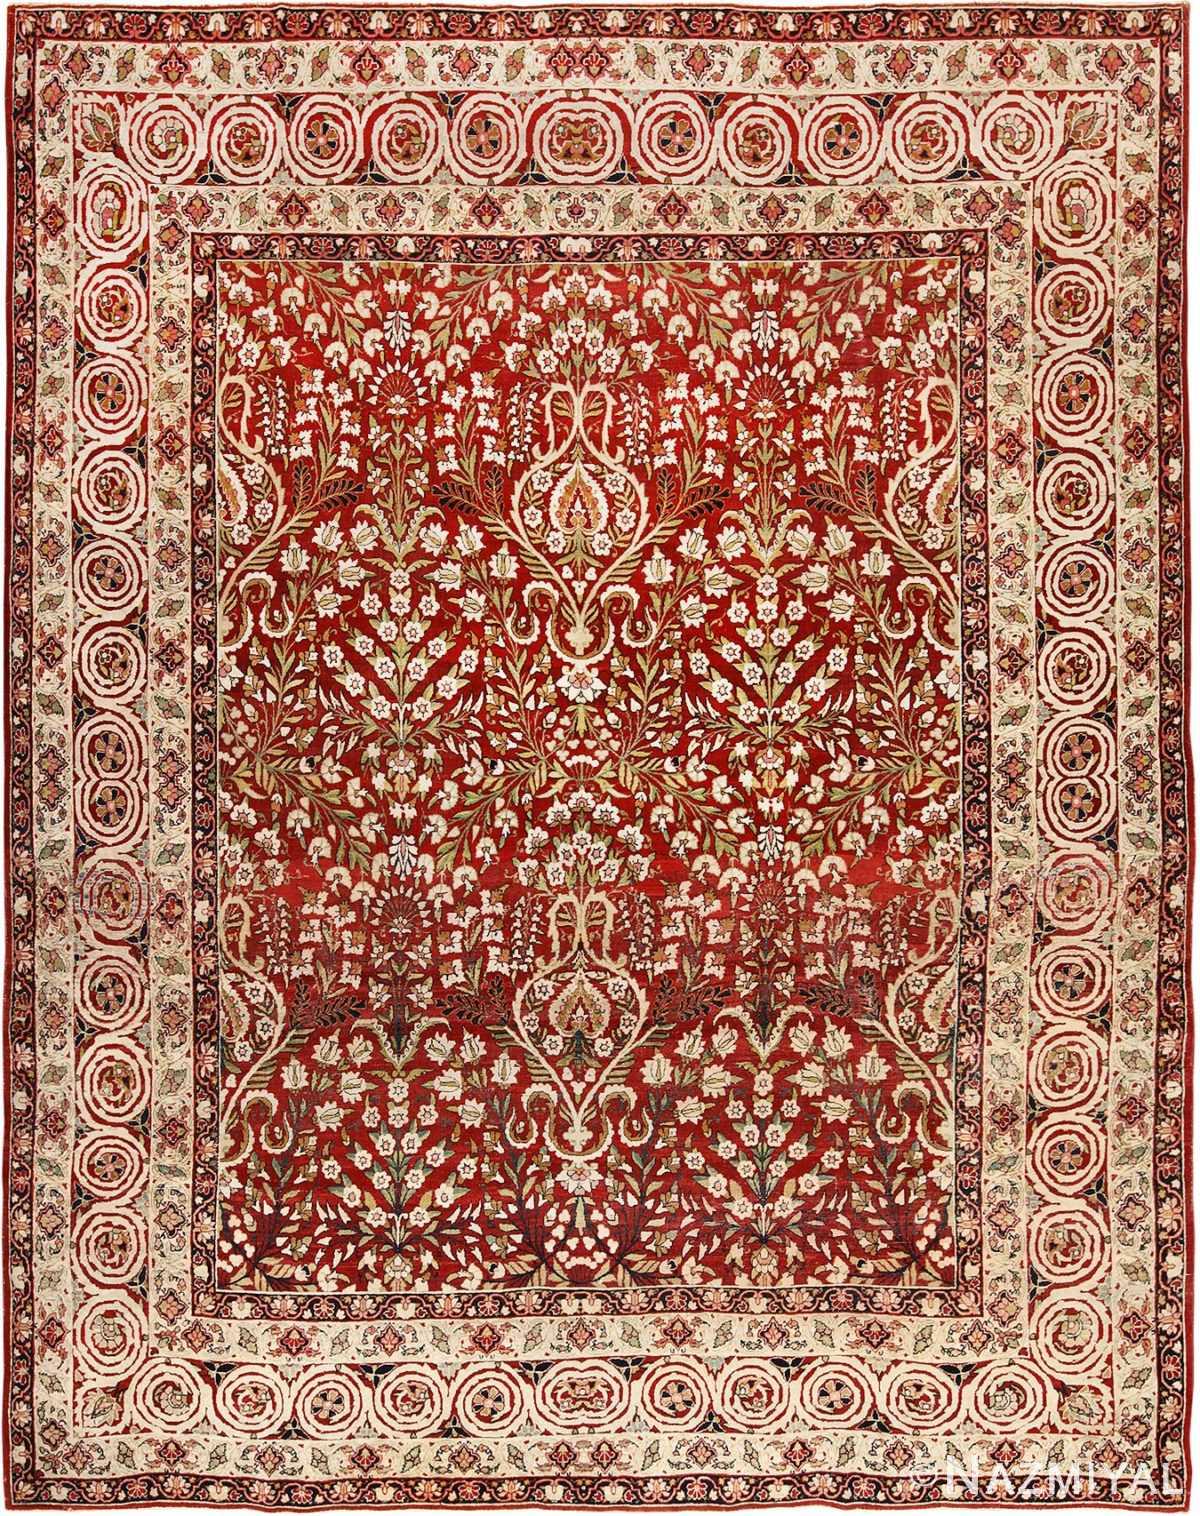 Antique Room Size Persian Kerman Carpet 49900 by Nazmiyal